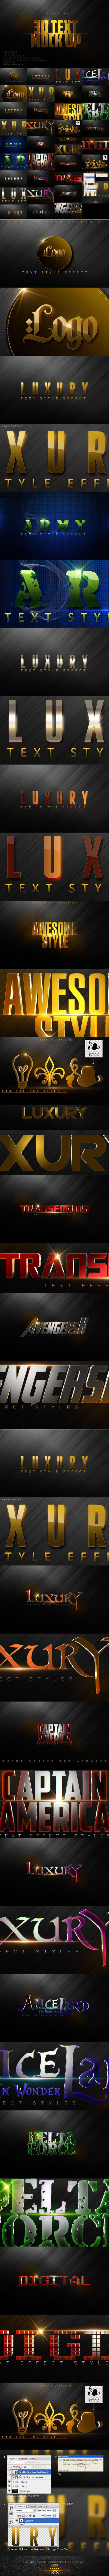 Bundle Luxury Text Styles V1C.3 - Styles Photoshop